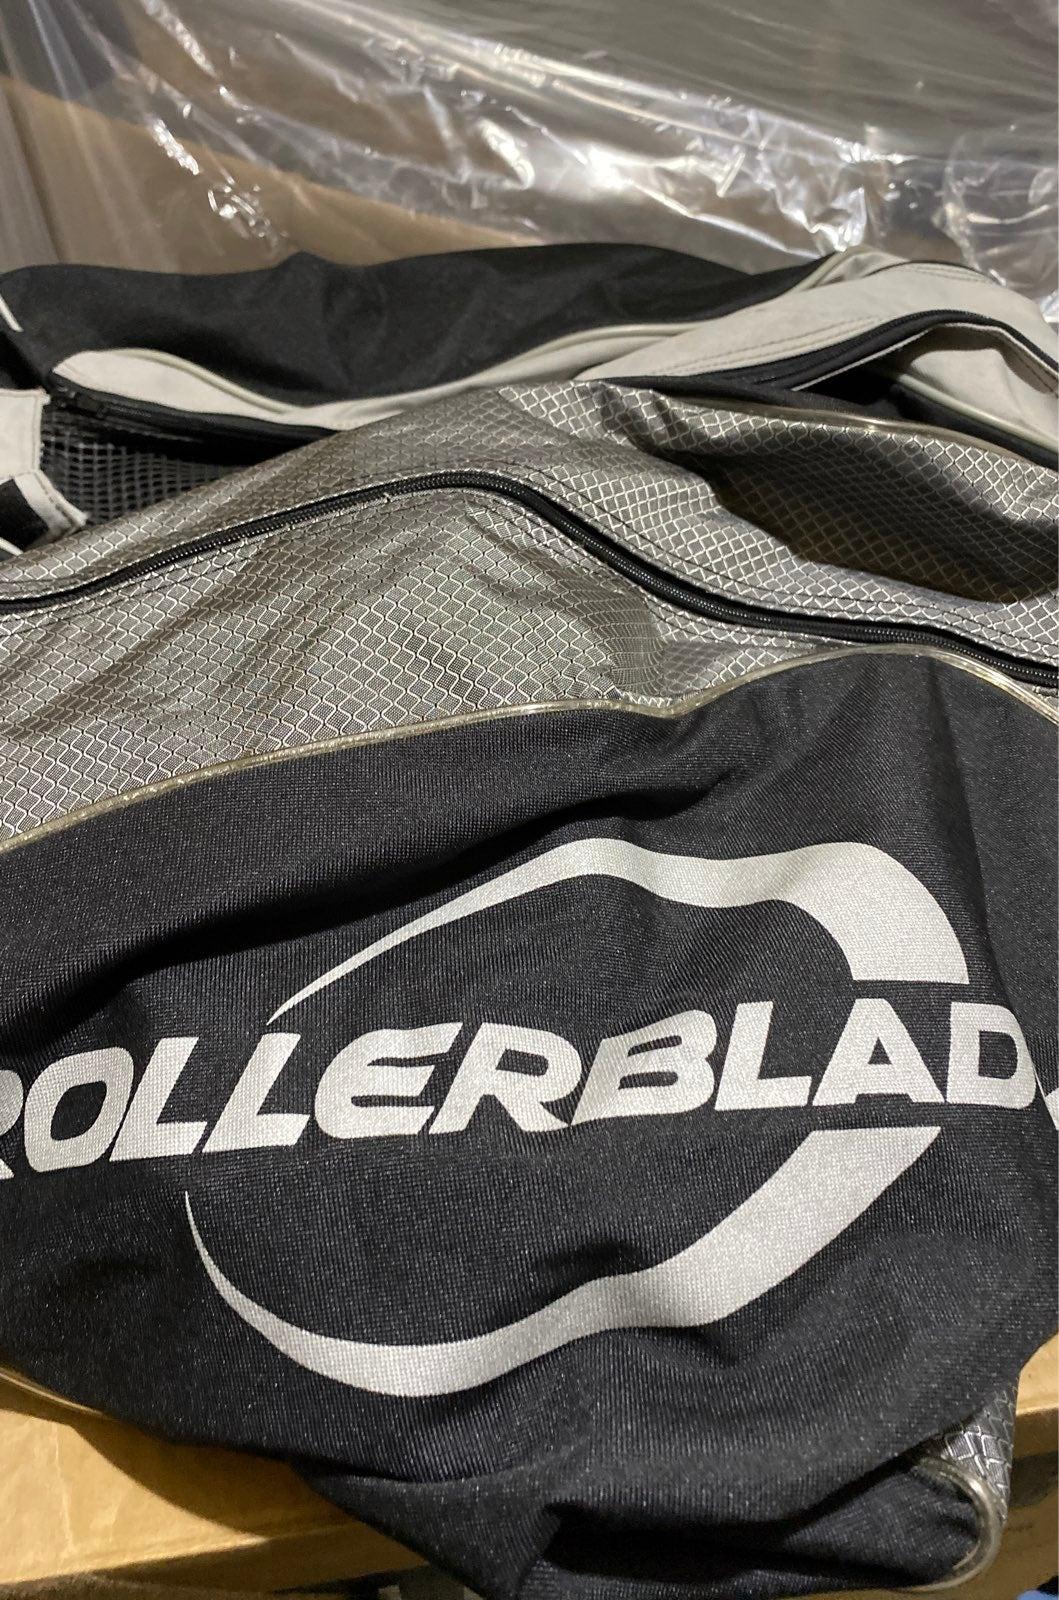 2 Roller Skate bags for 1 price